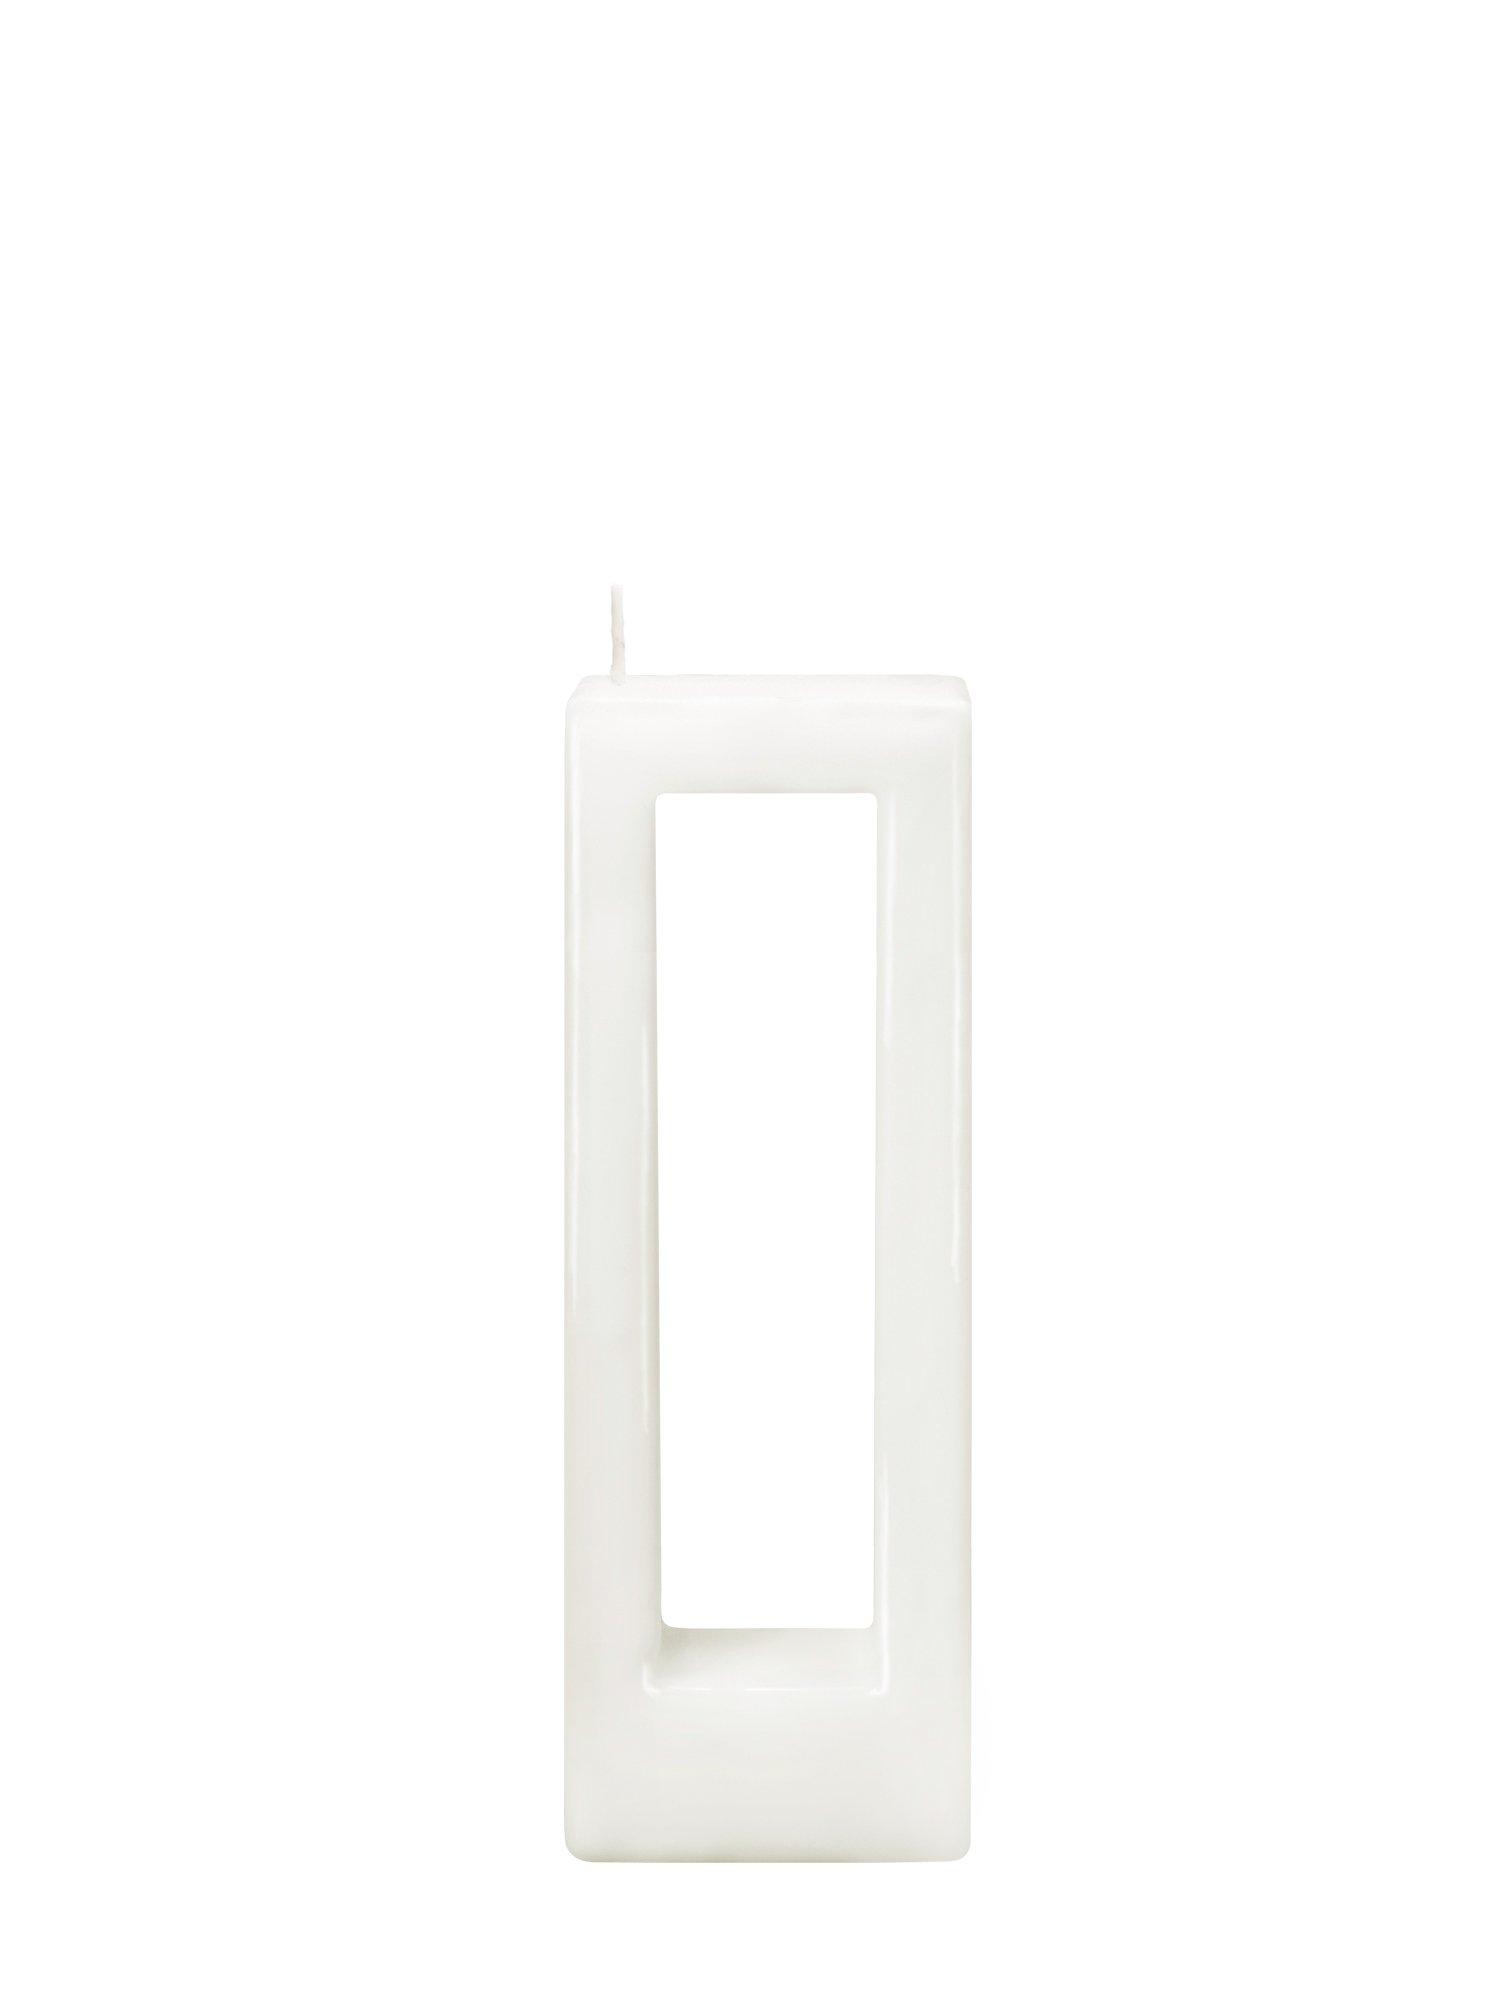 Alusi Multiflame Candle Quadra Due, Unscented (White)